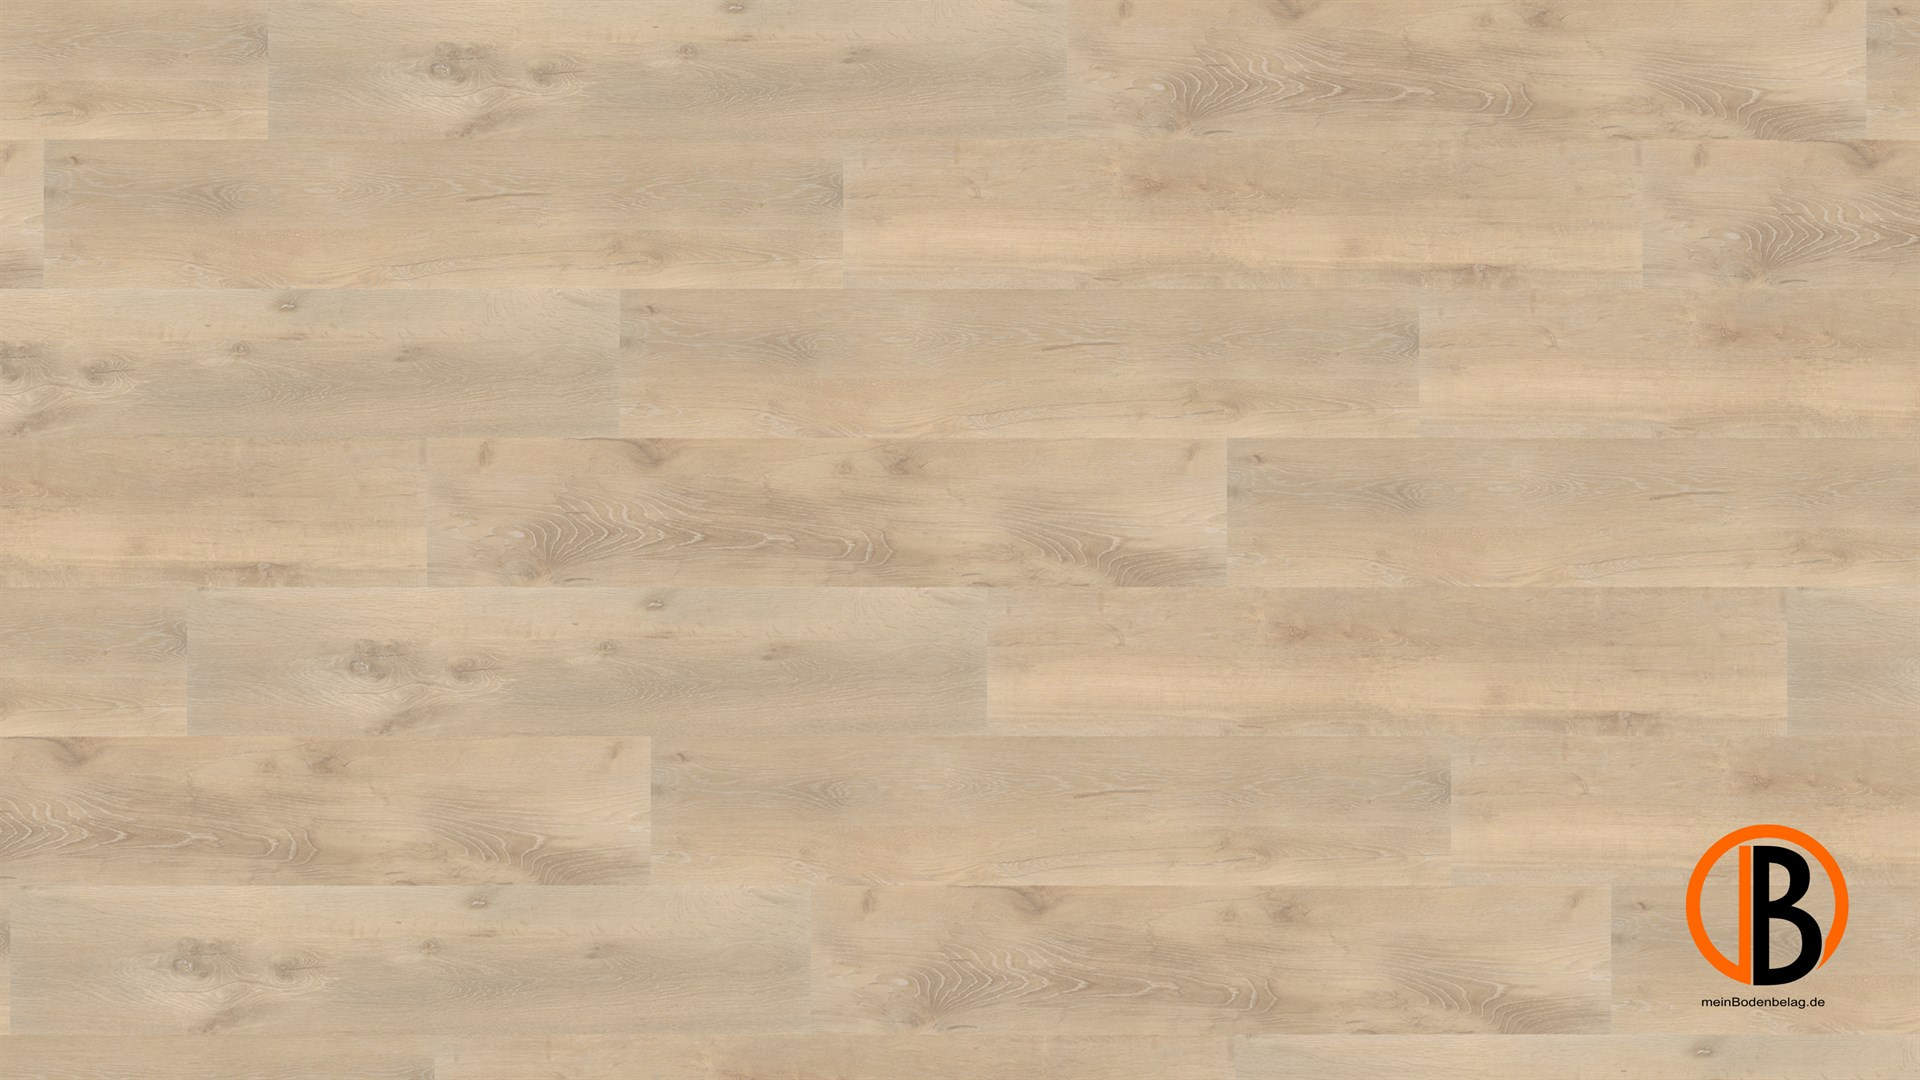 CINQUE KWG DESIGNBODEN ANTIGUA GREEN, PVC-FREI | 10000306;0 | Bild 1